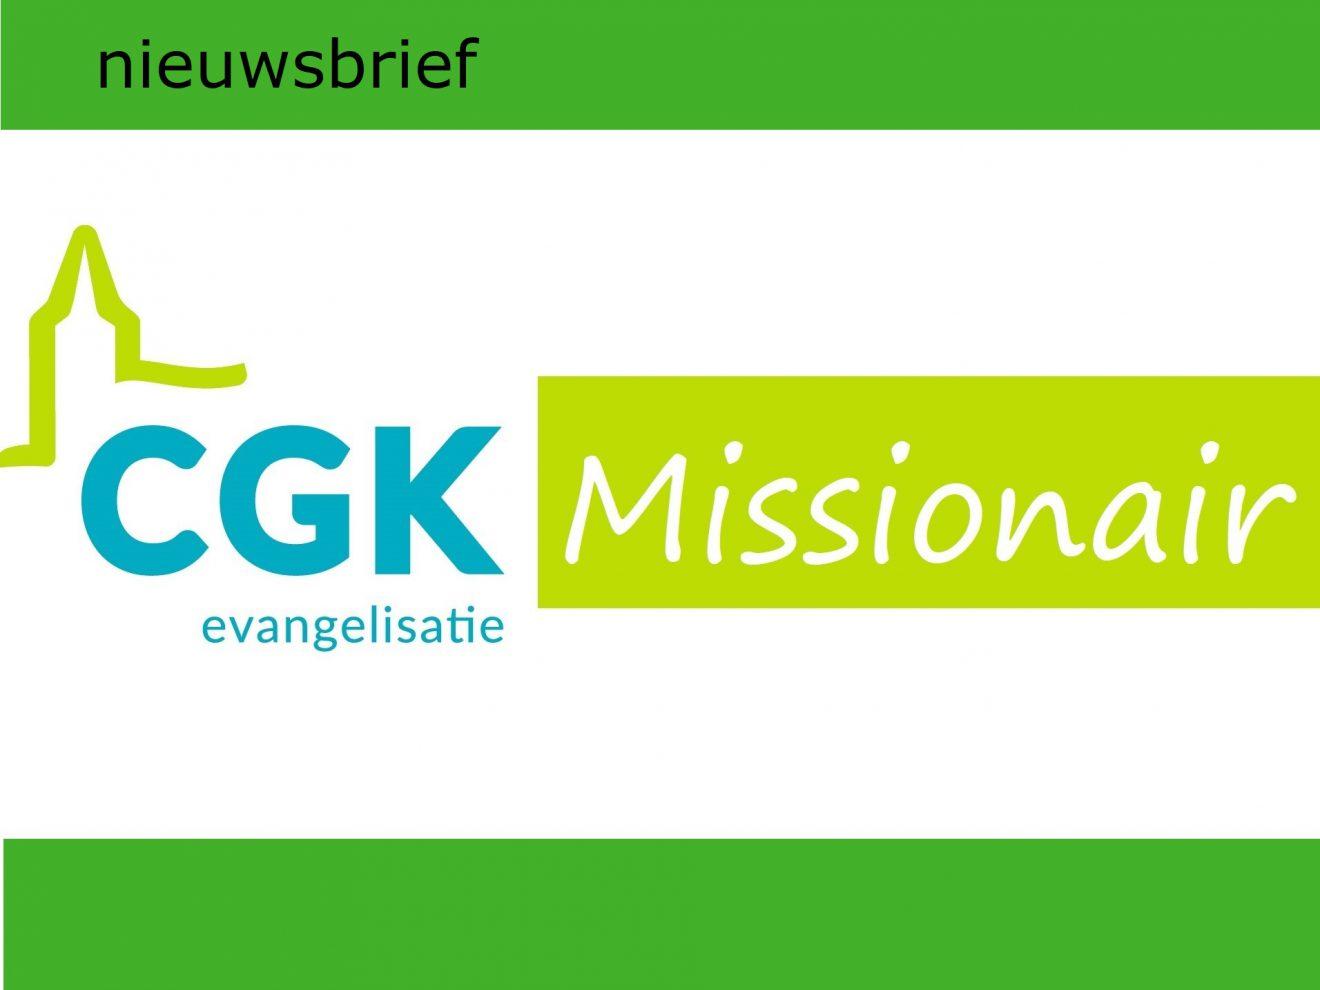 CGK Missionair